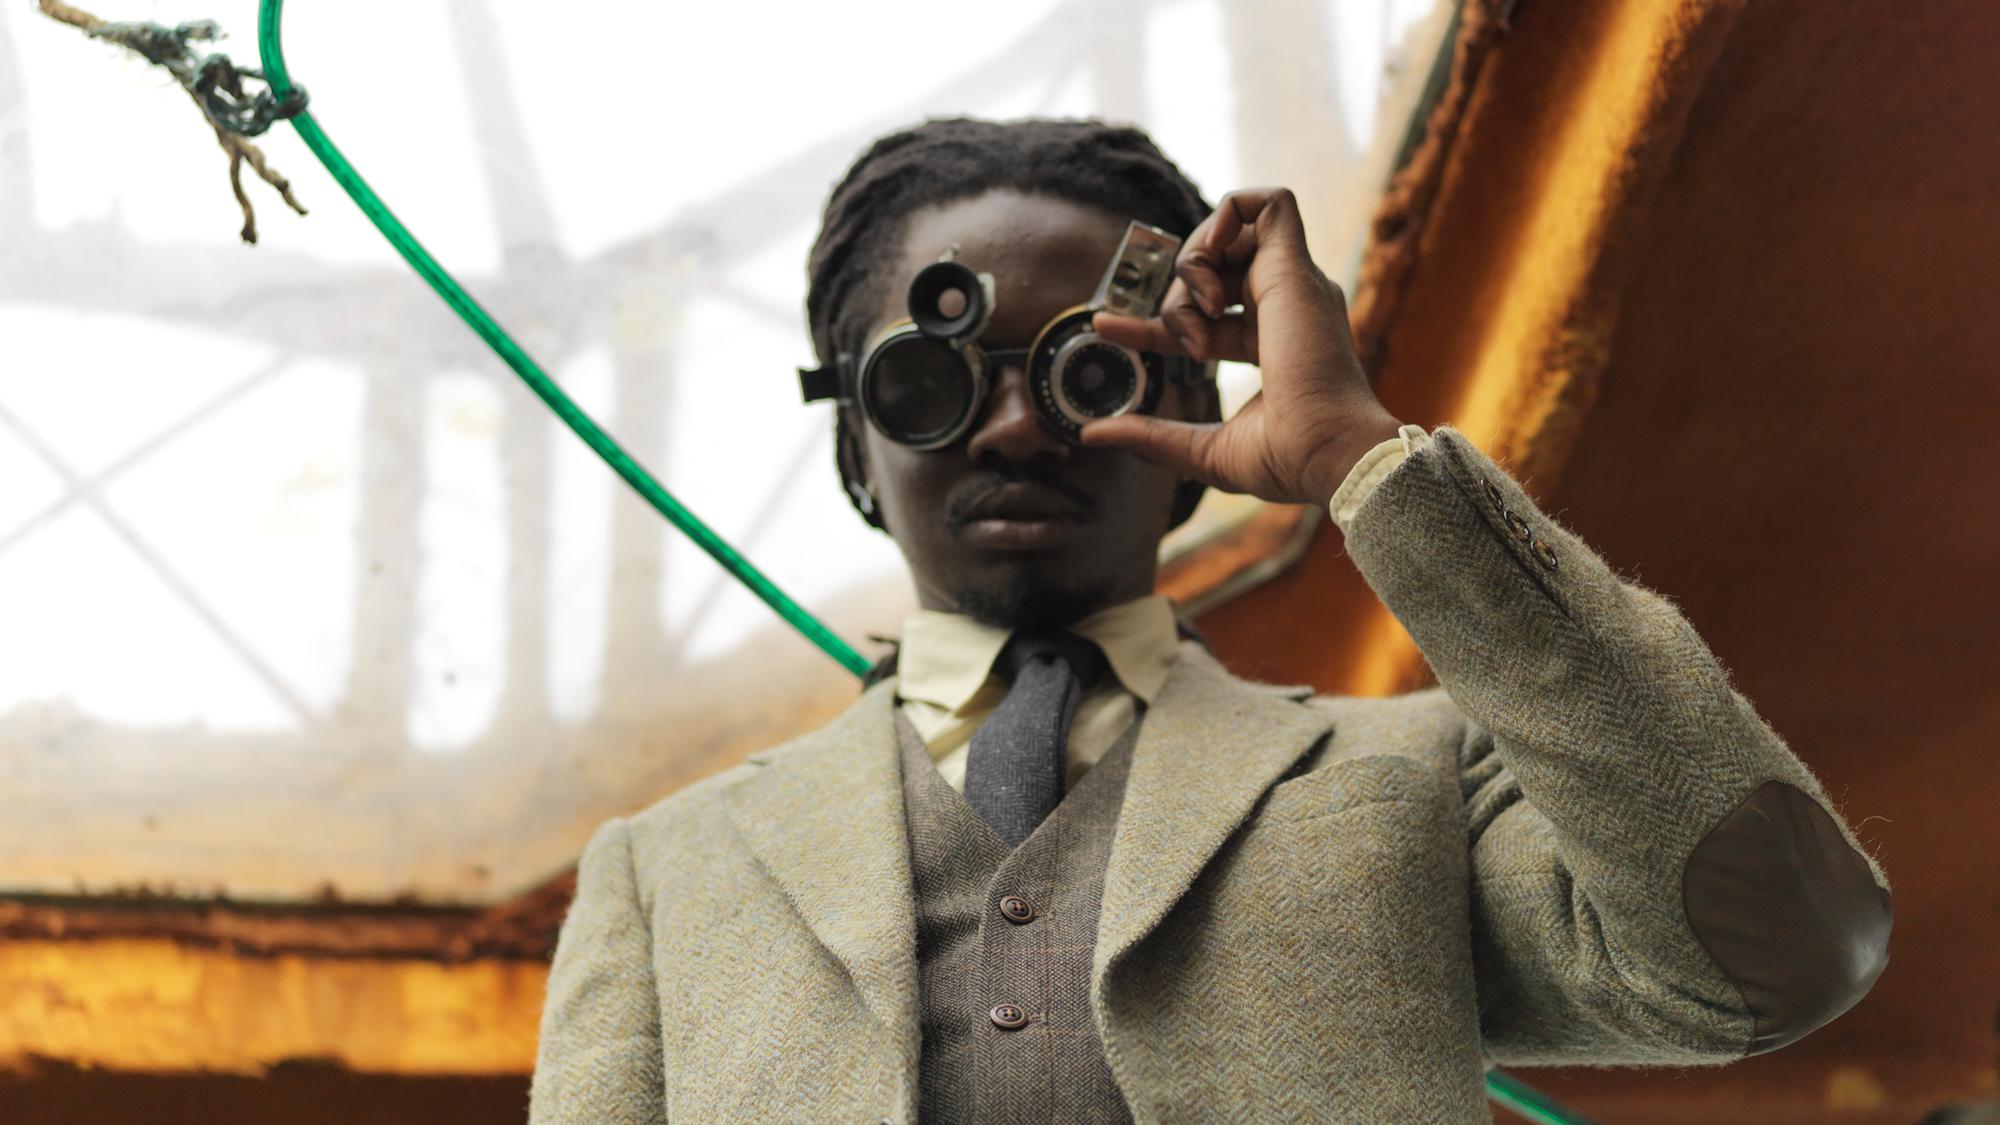 Finding Fanon 2015 169(PR shot 3) Larry Achiampong & David Blandy 2000.jpg